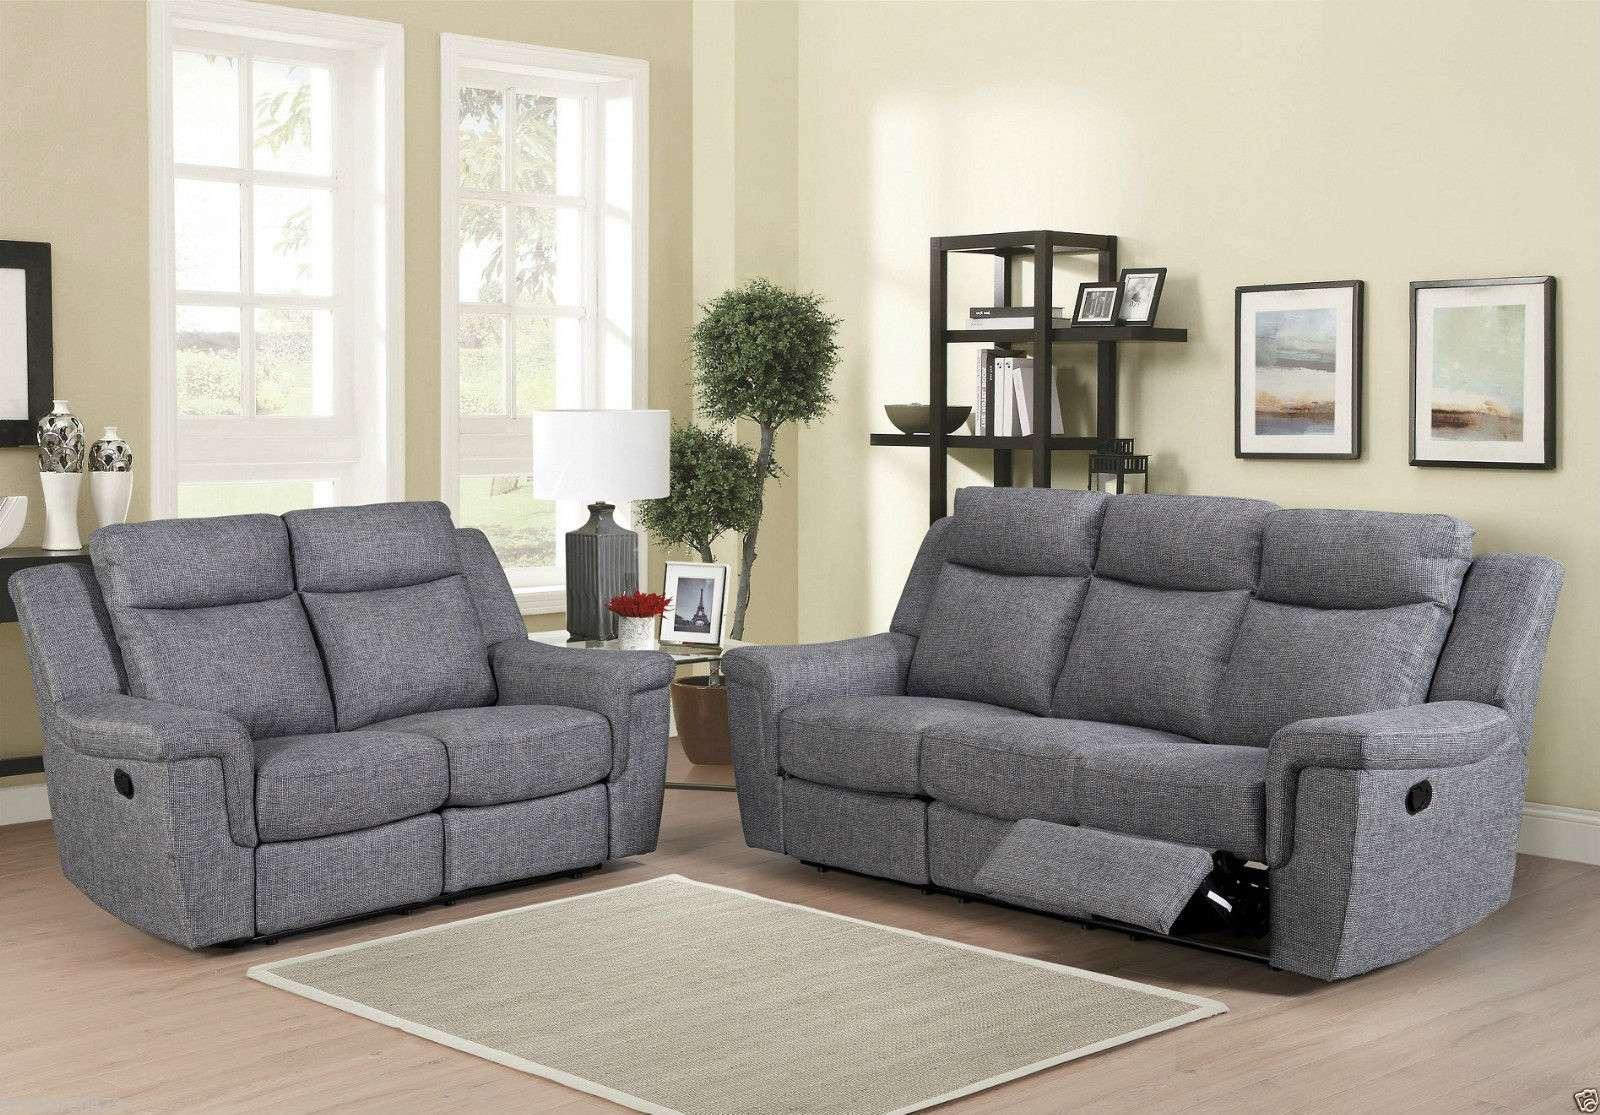 Grey Fabric Recliner Sofa Armchair